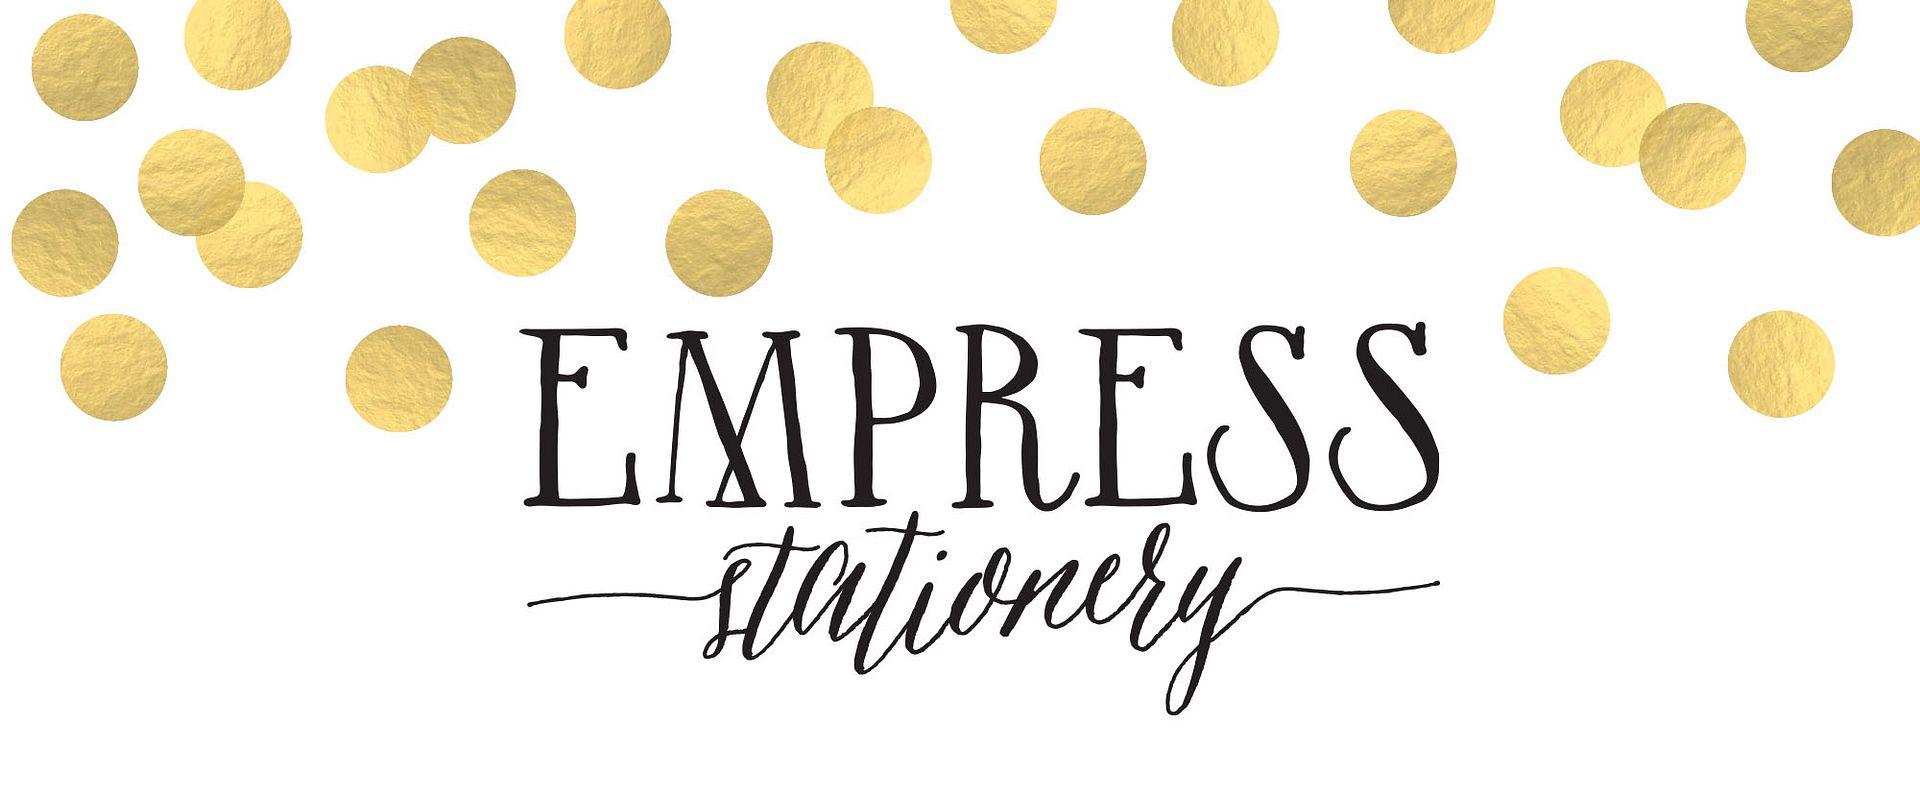 Empress Stationery